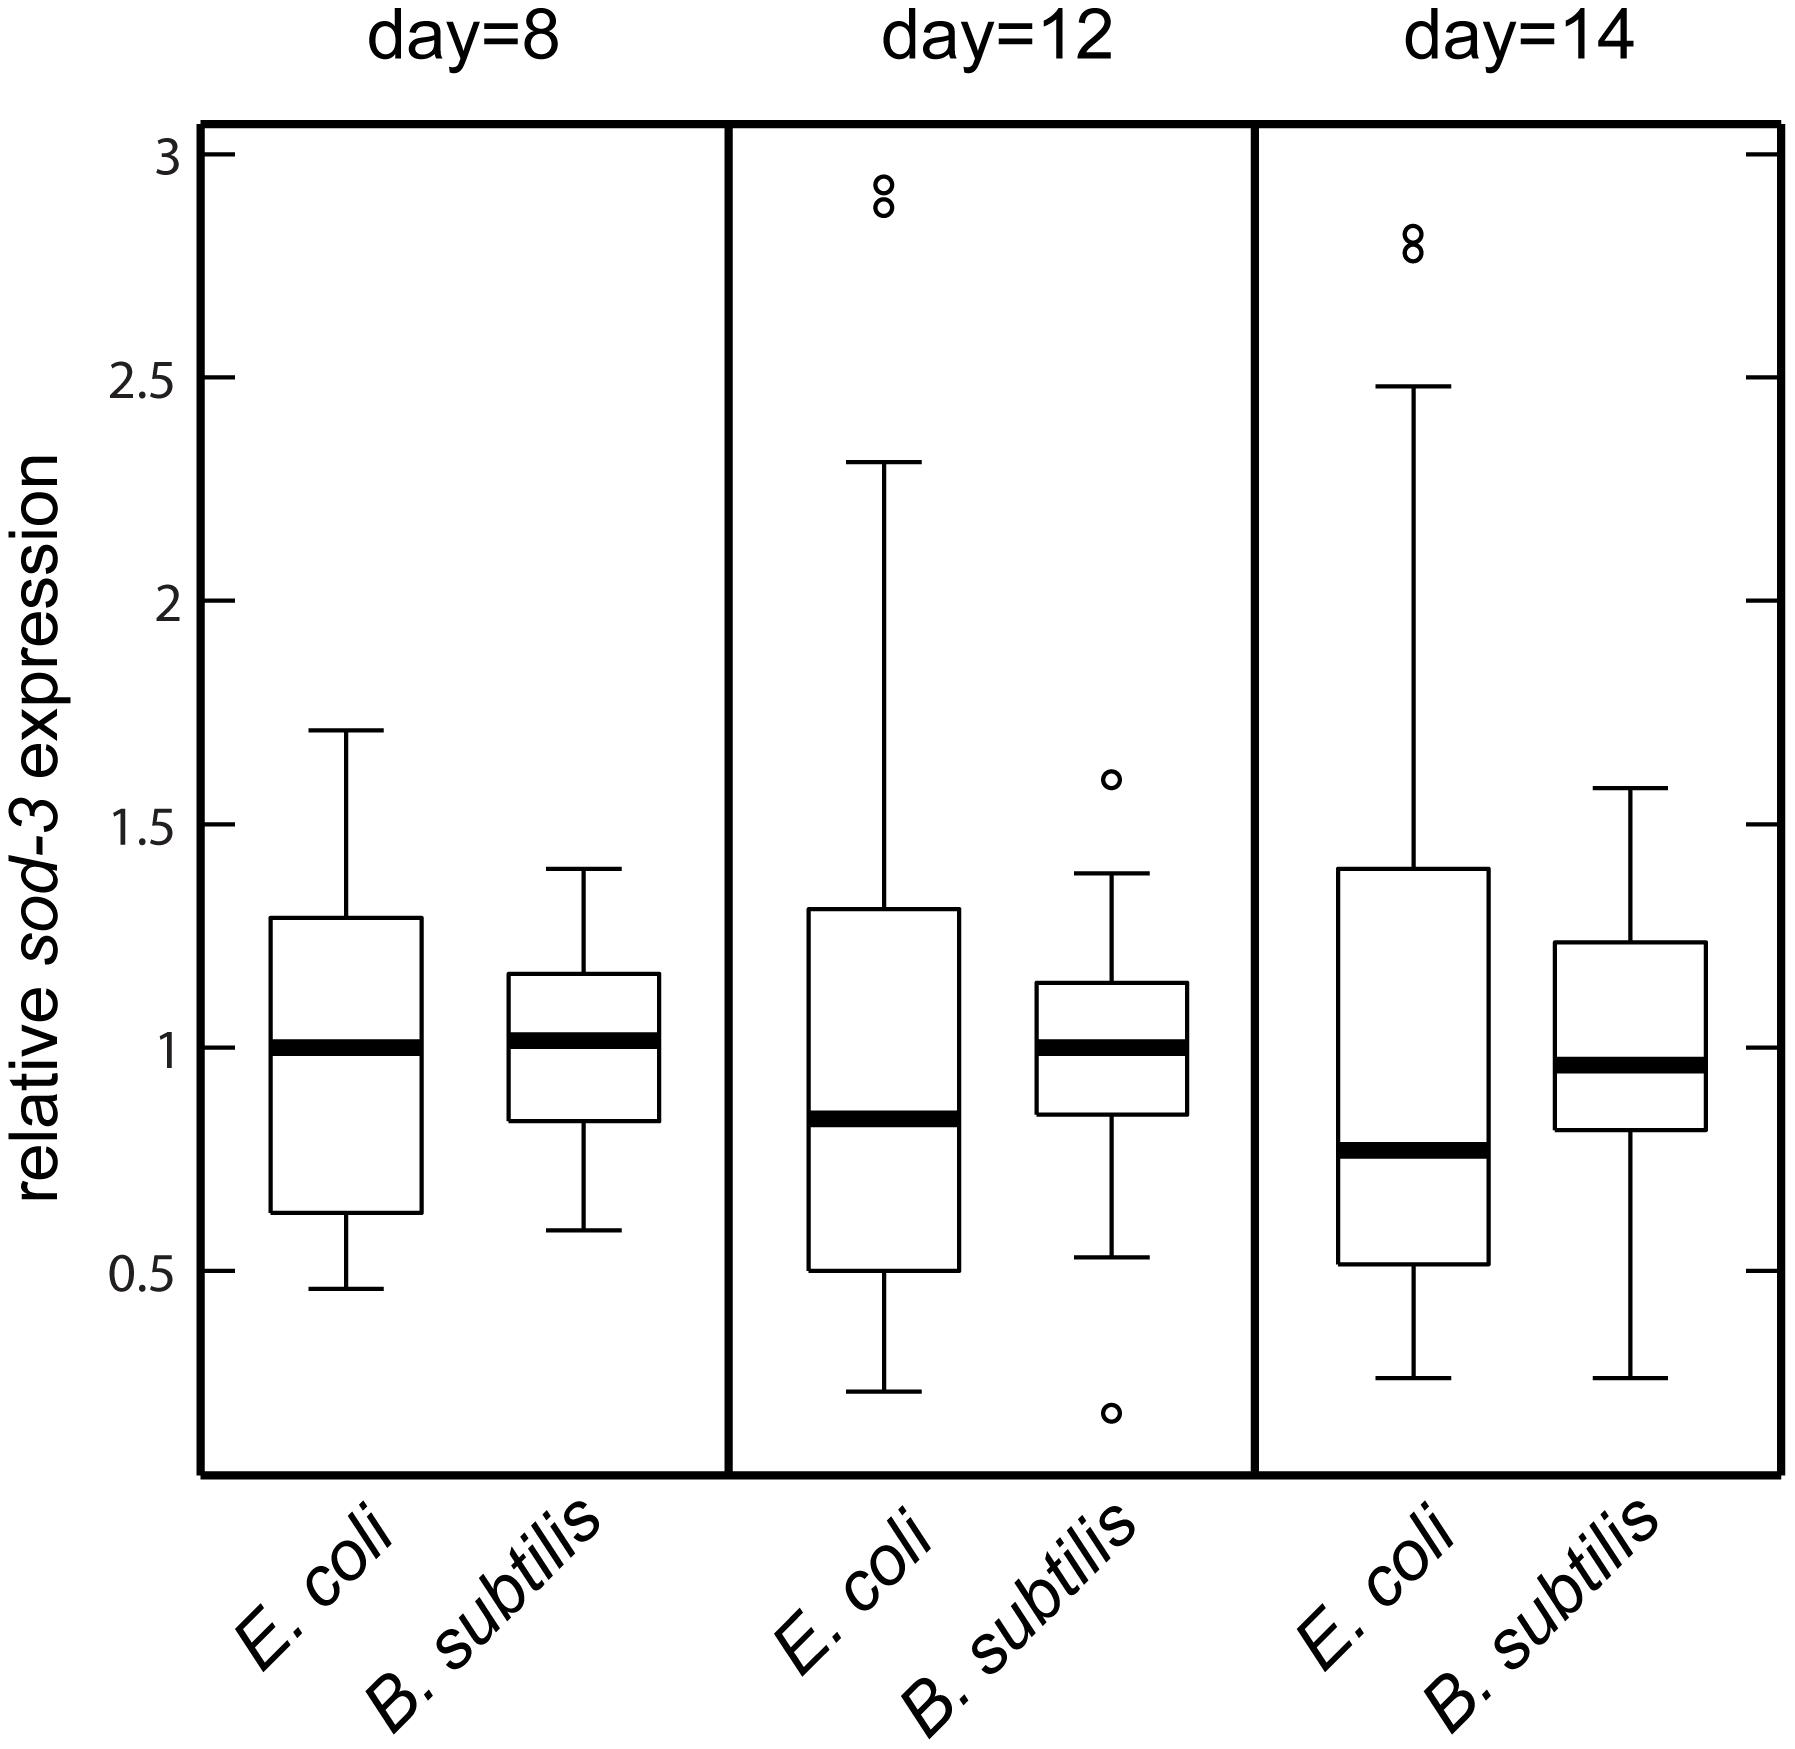 <i>sod-3</i> expression variability is lower for worms fed <i>B. subtilis</i> compared to worms fed <i>E. coli</i>.